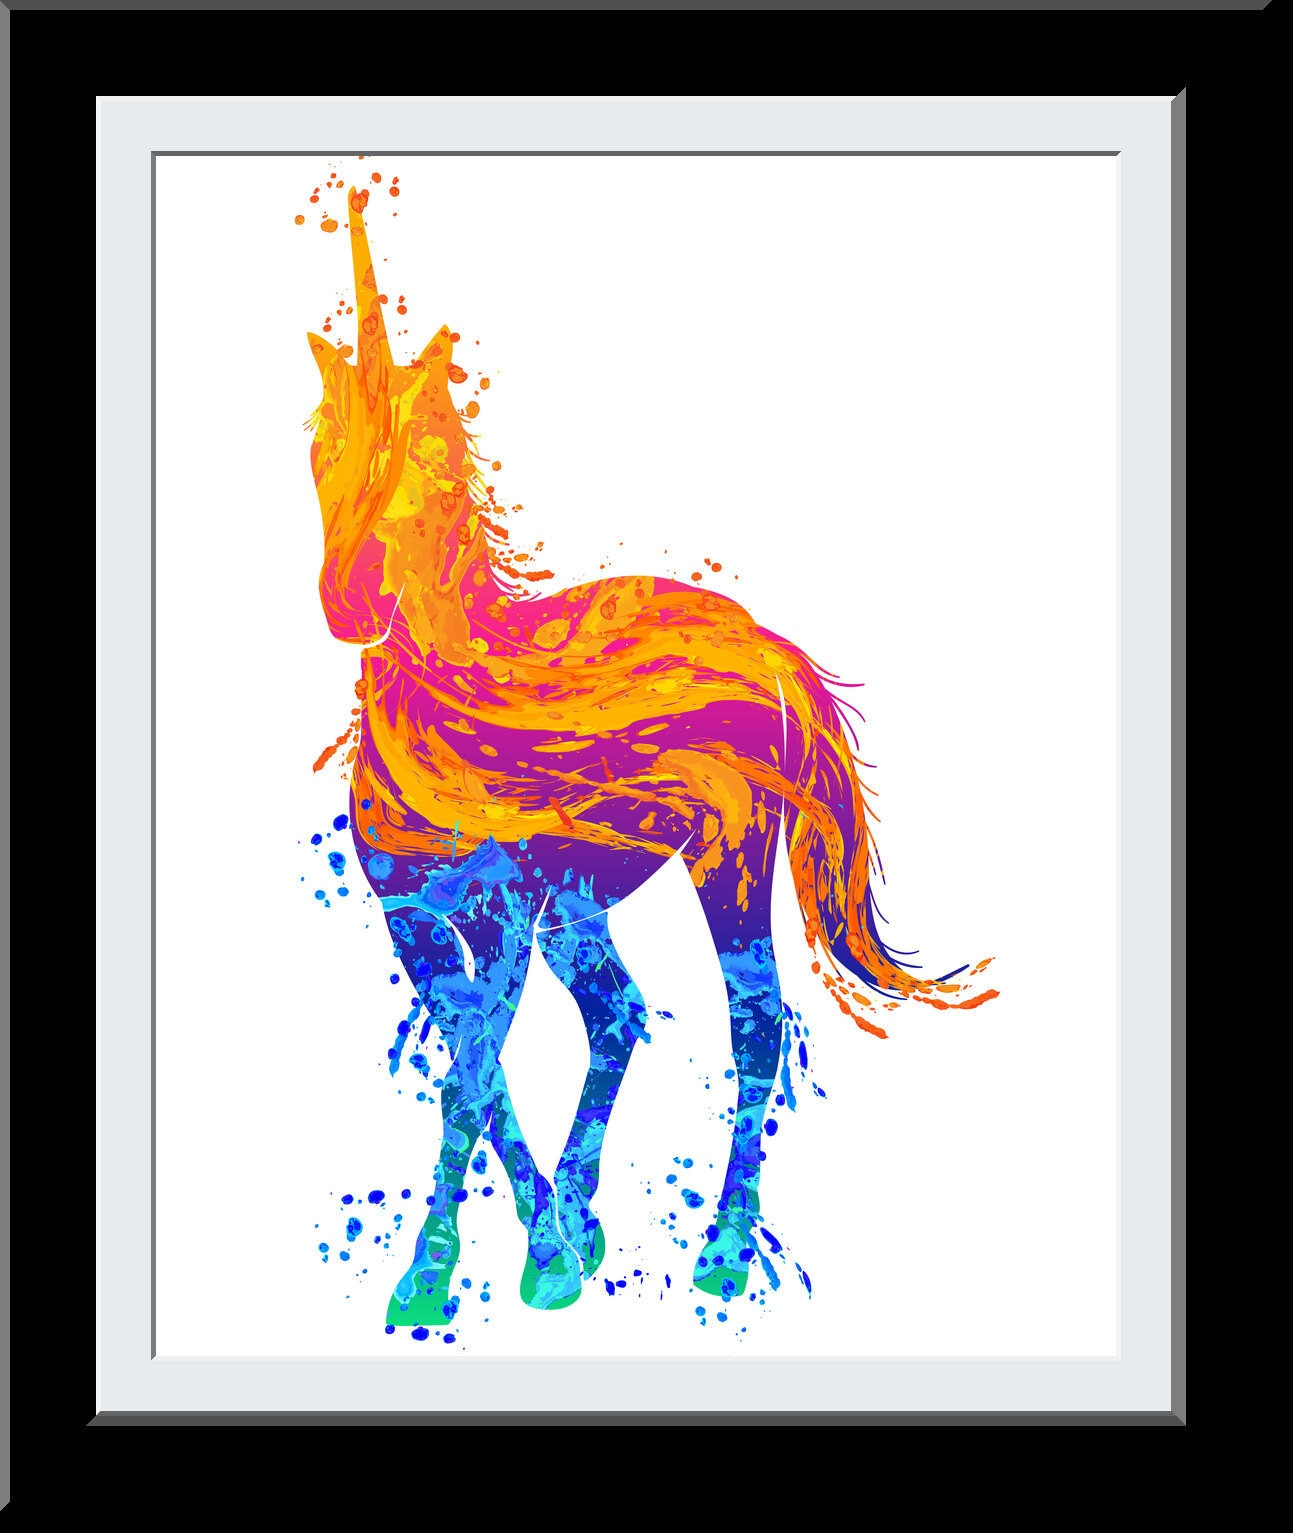 Unicorn WaterColor Print - Unicorn Gift - Bedroom Décor- Fire+Water Elemental Digital Gift for Girls - Nursery Deor Wall Art